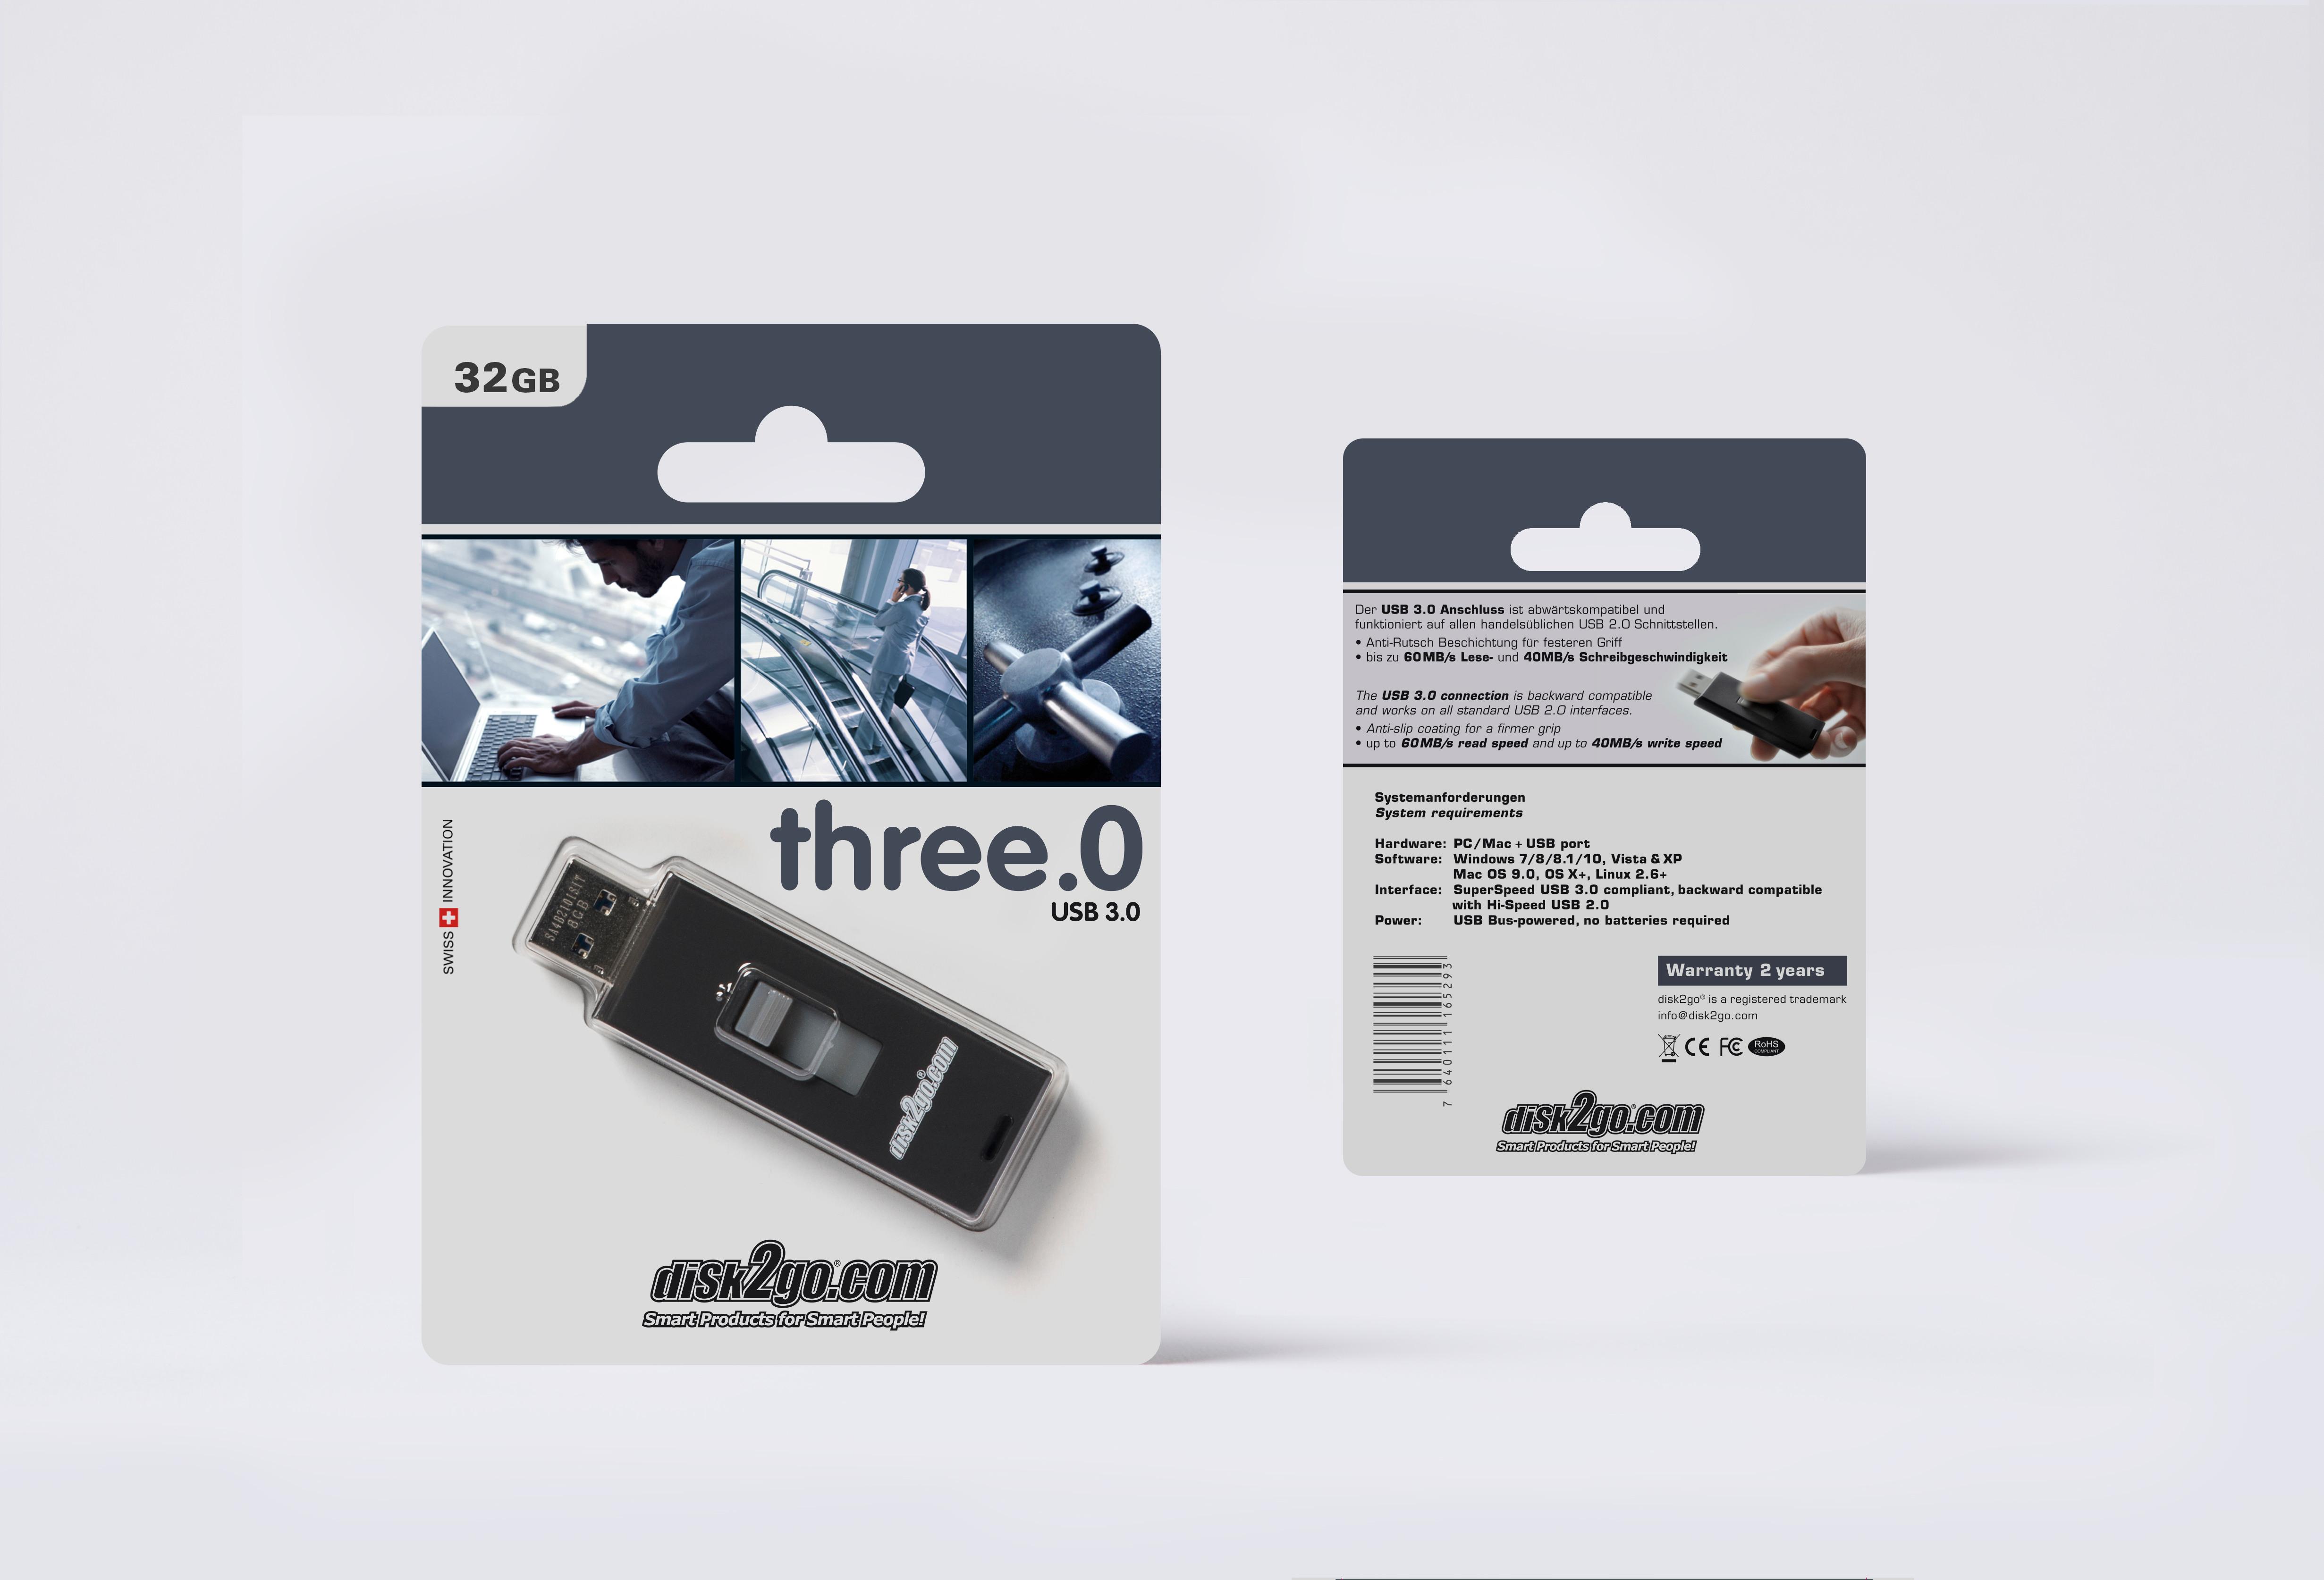 DISK2GO USB-Stick three.O 32GB 30006463 USB 3.0